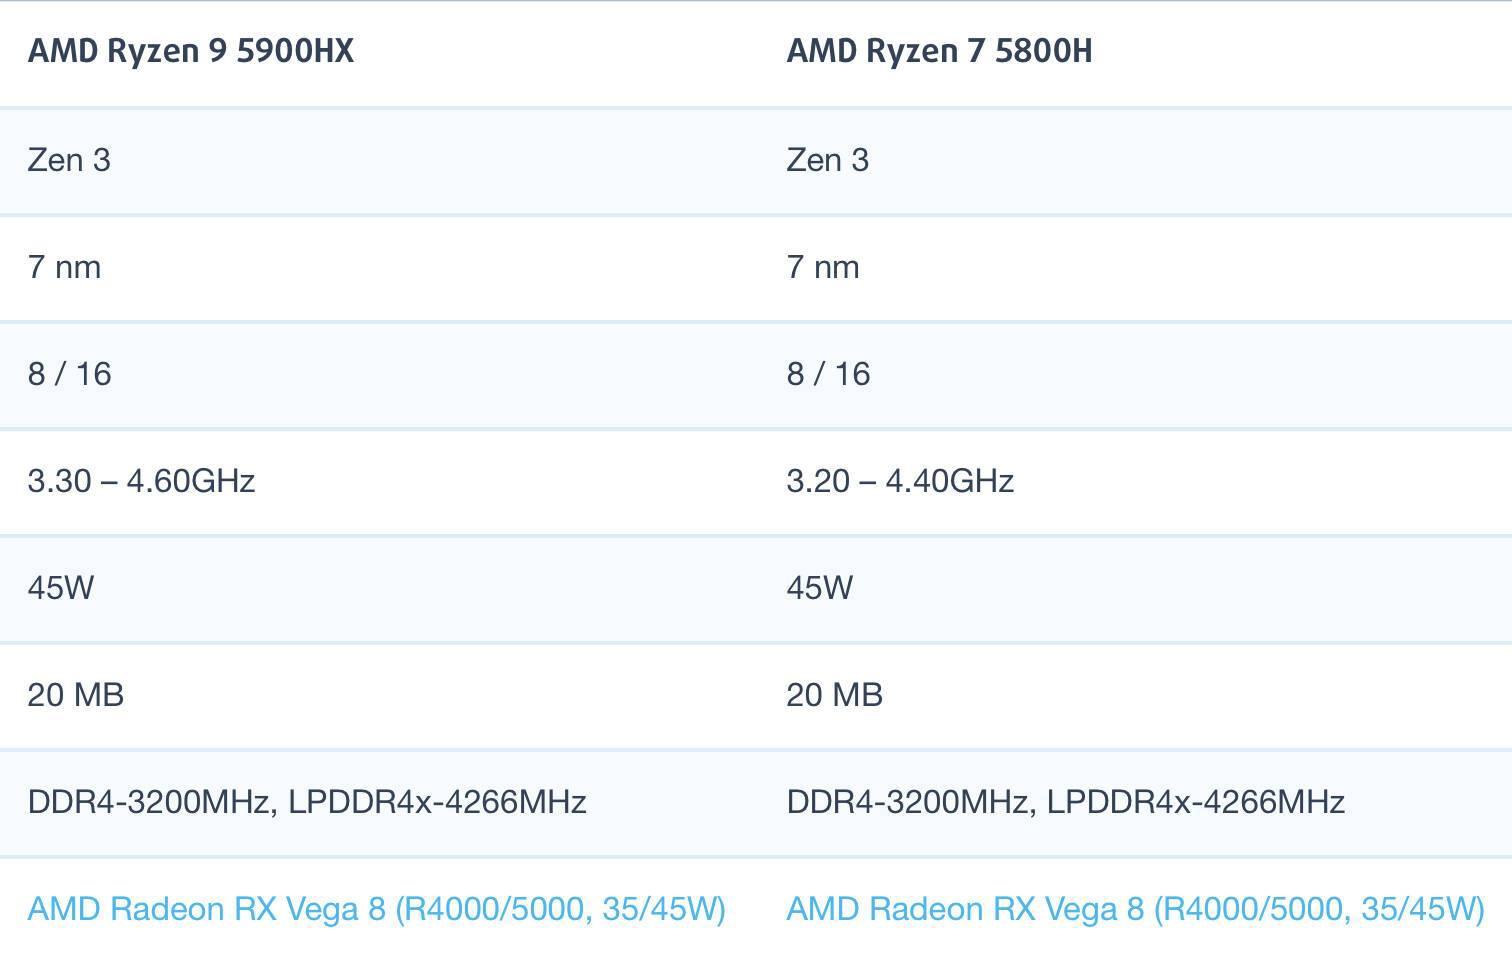 AMD锐龙R9 5900HX和R7 5800H性能跑分对比评测